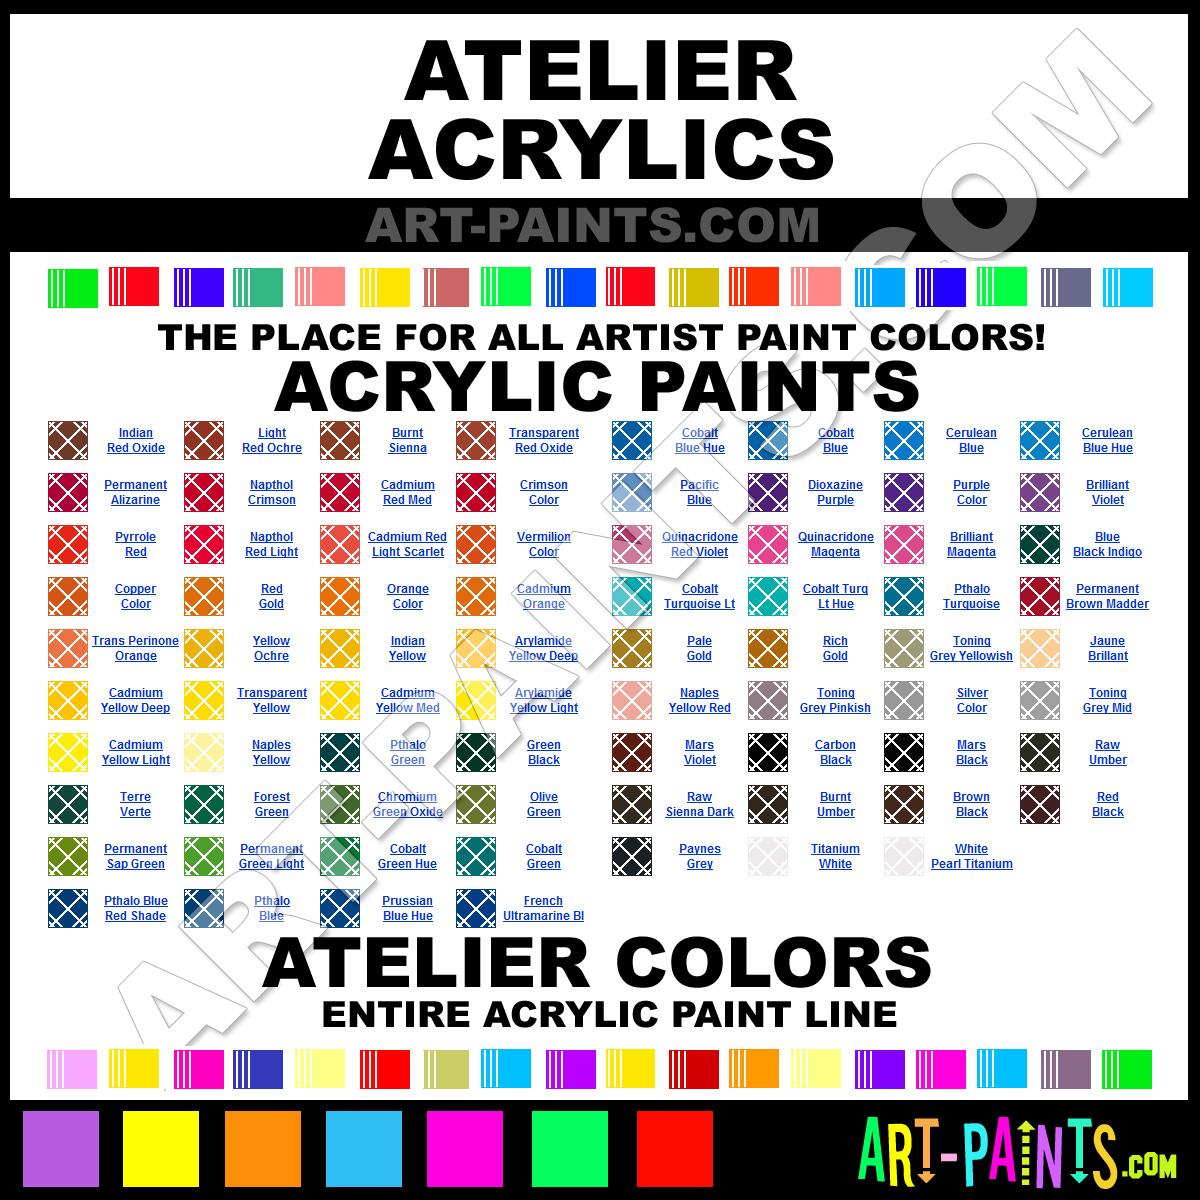 Paint Colors And Brands: Atelier Acrylic Paint Brands